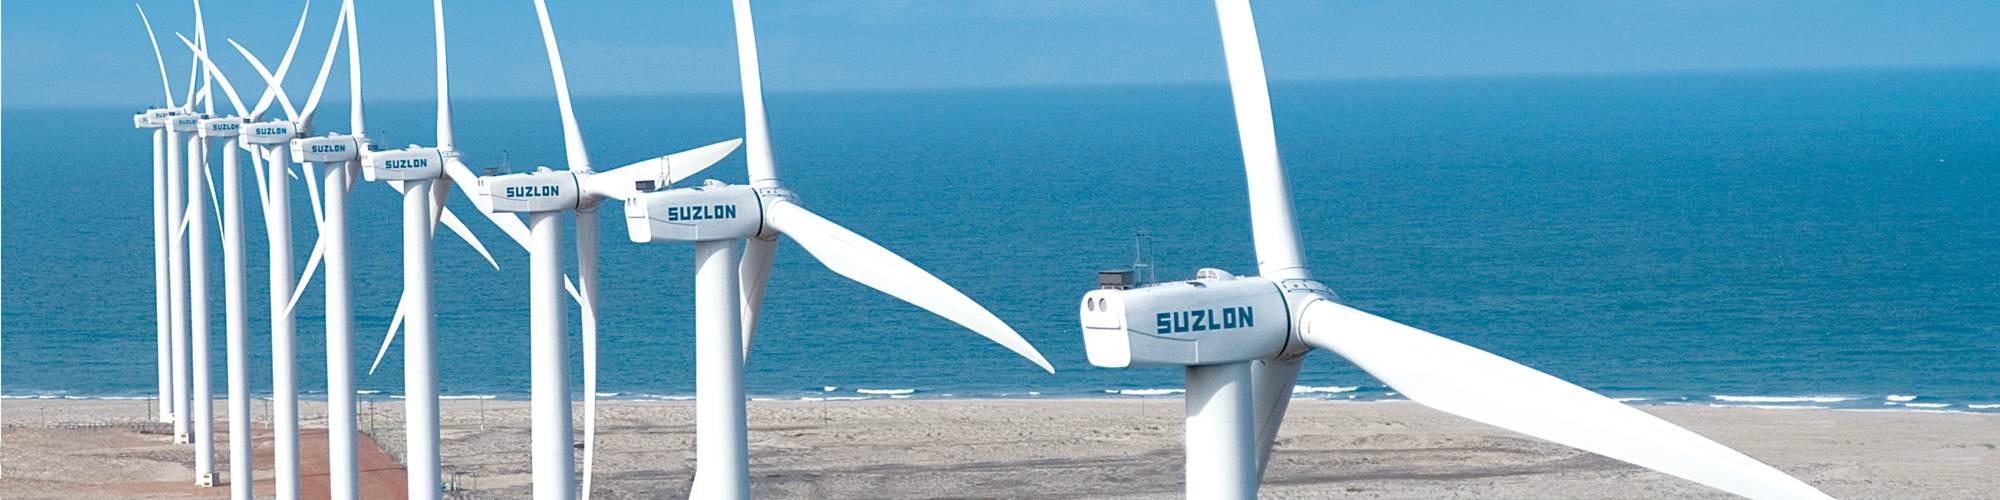 Suzlon风力涡轮机